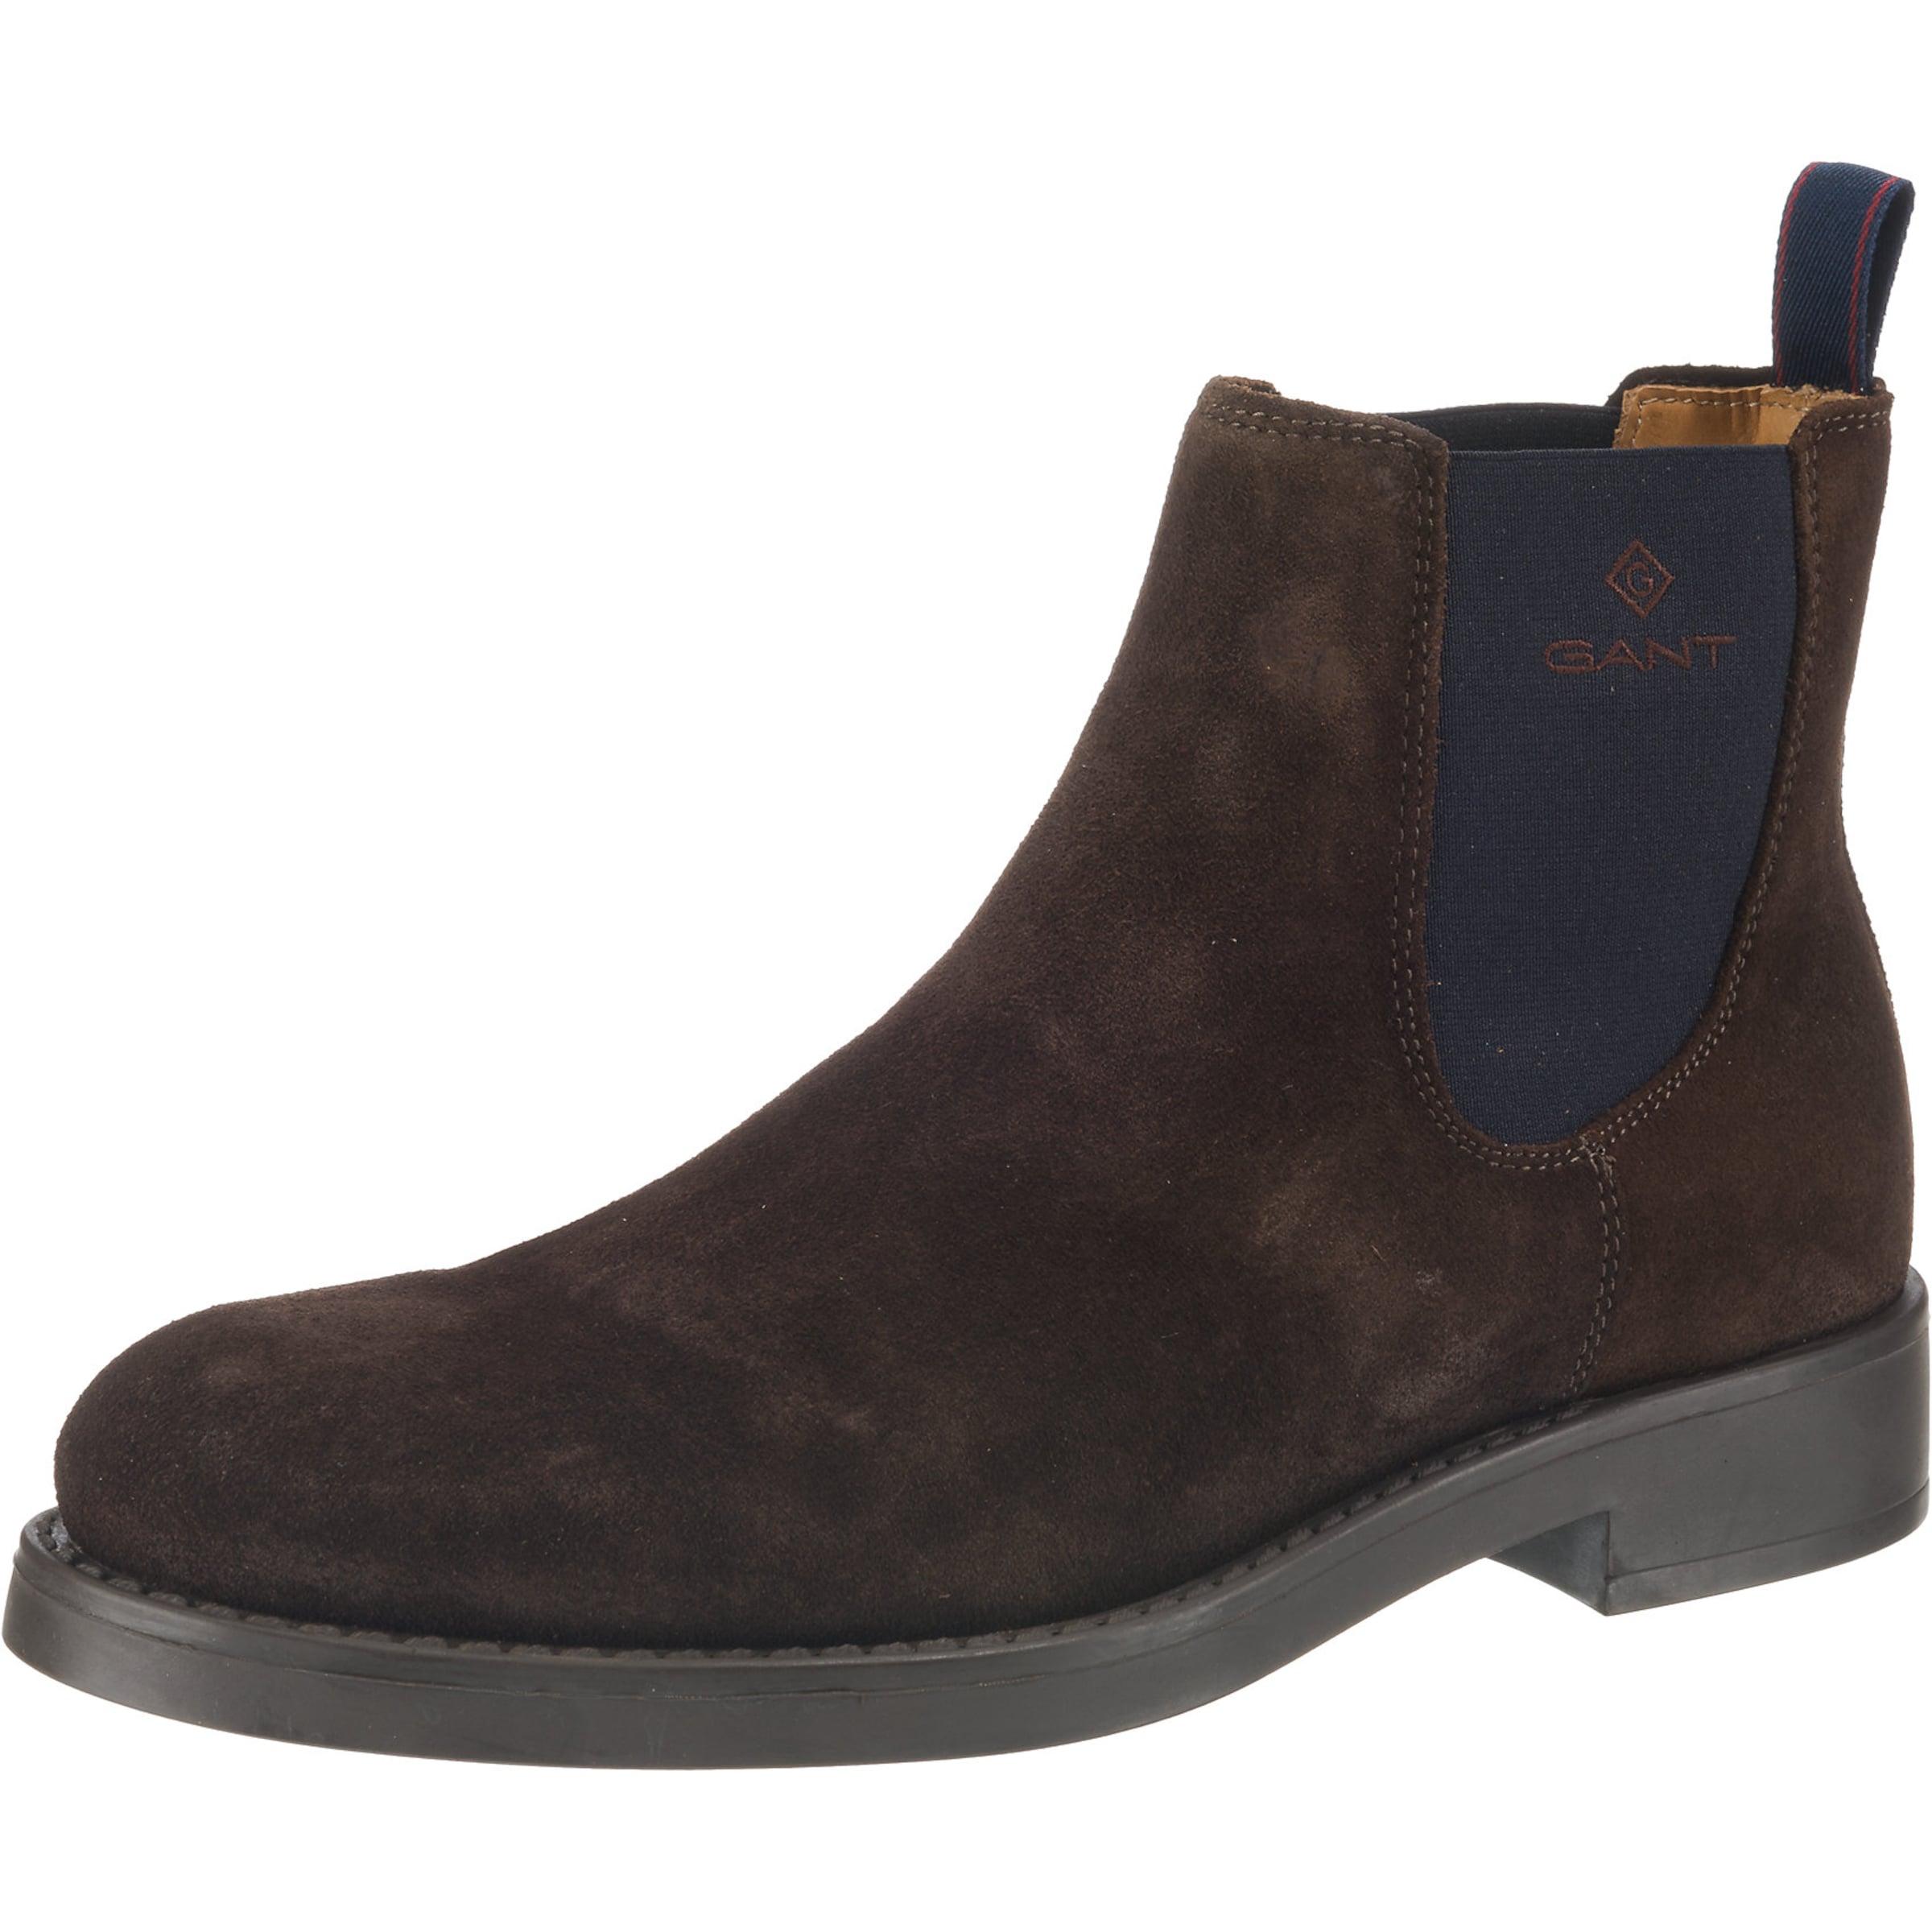 'oscar' Gant Boots DunkelblauBraun Chelsea In DE2YW9IH